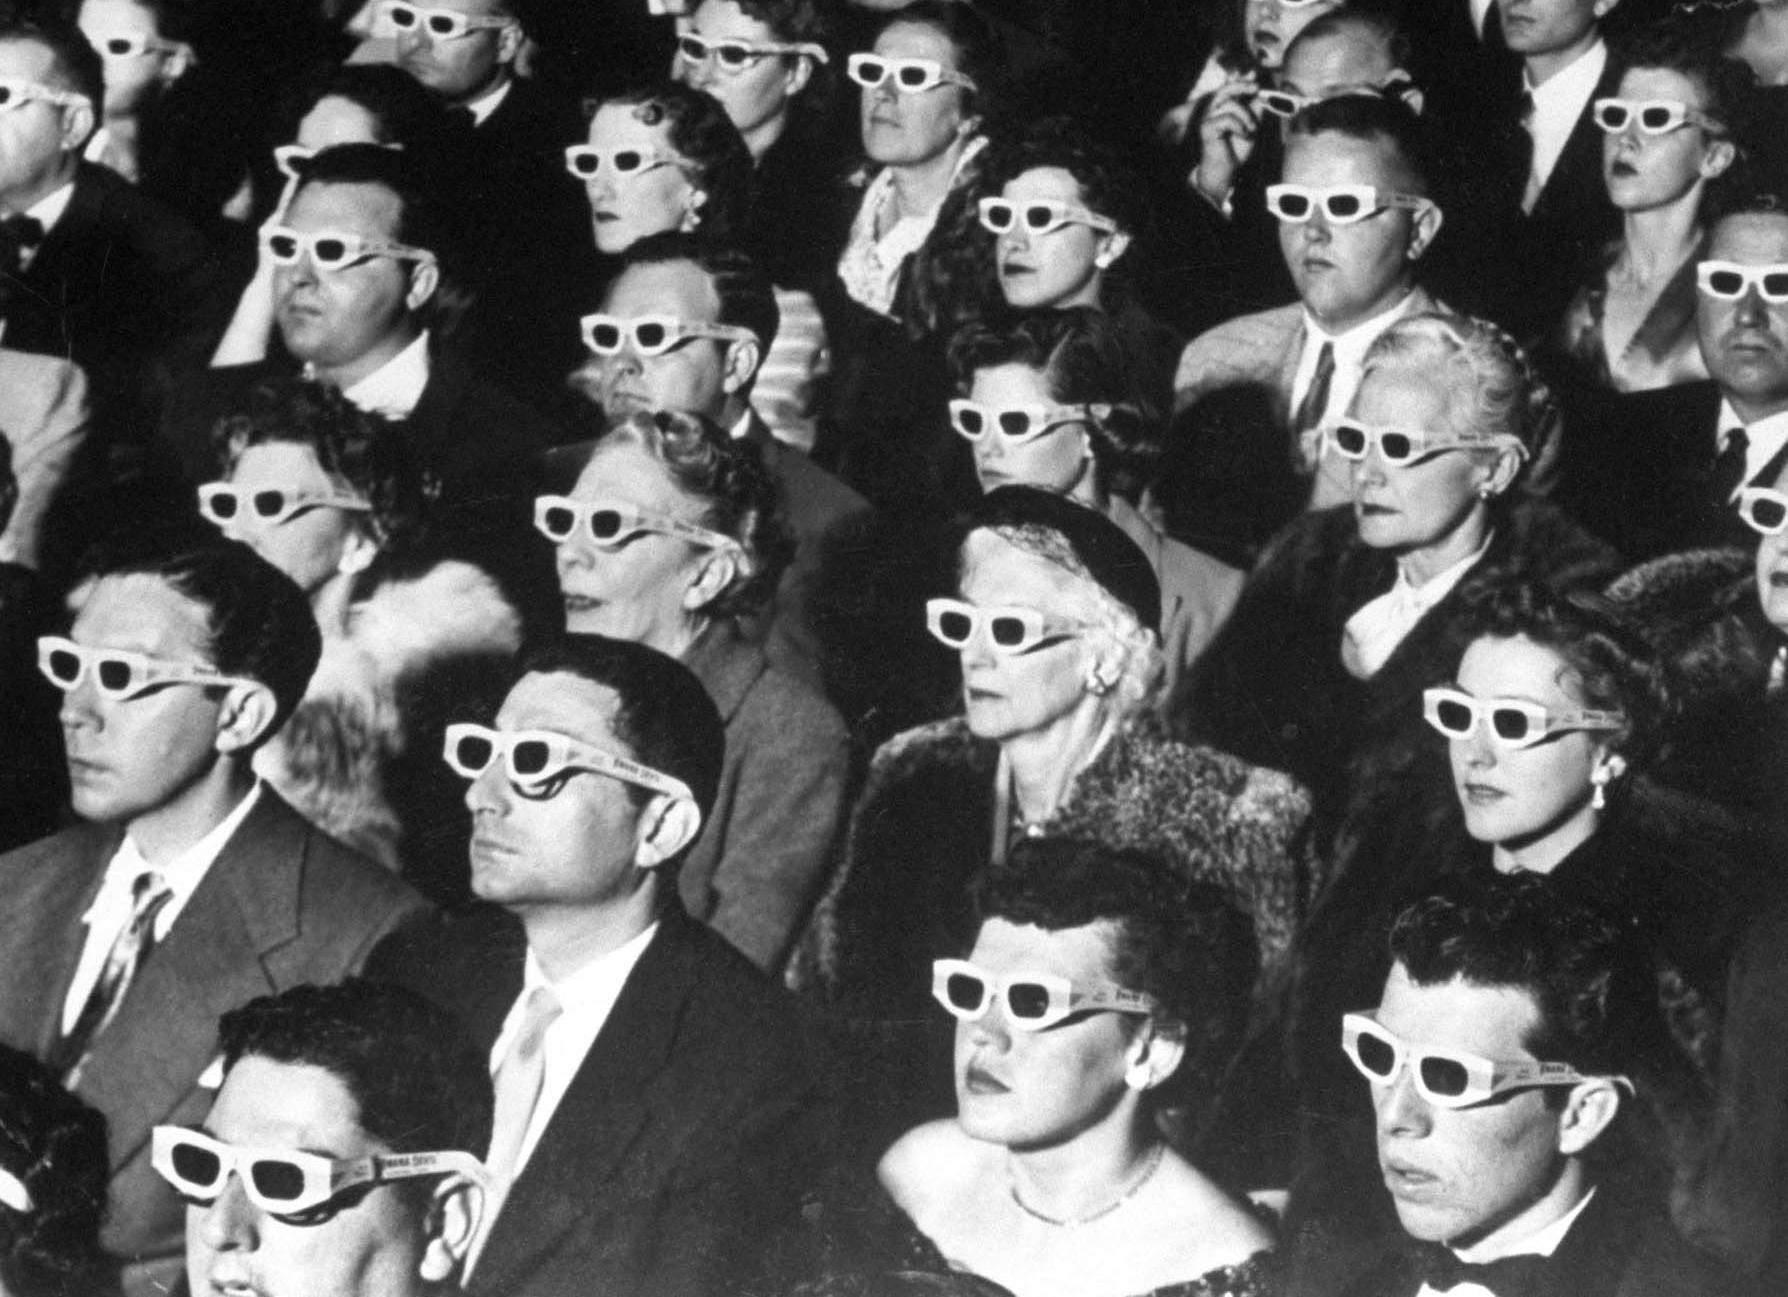 3-D Movie Viewers